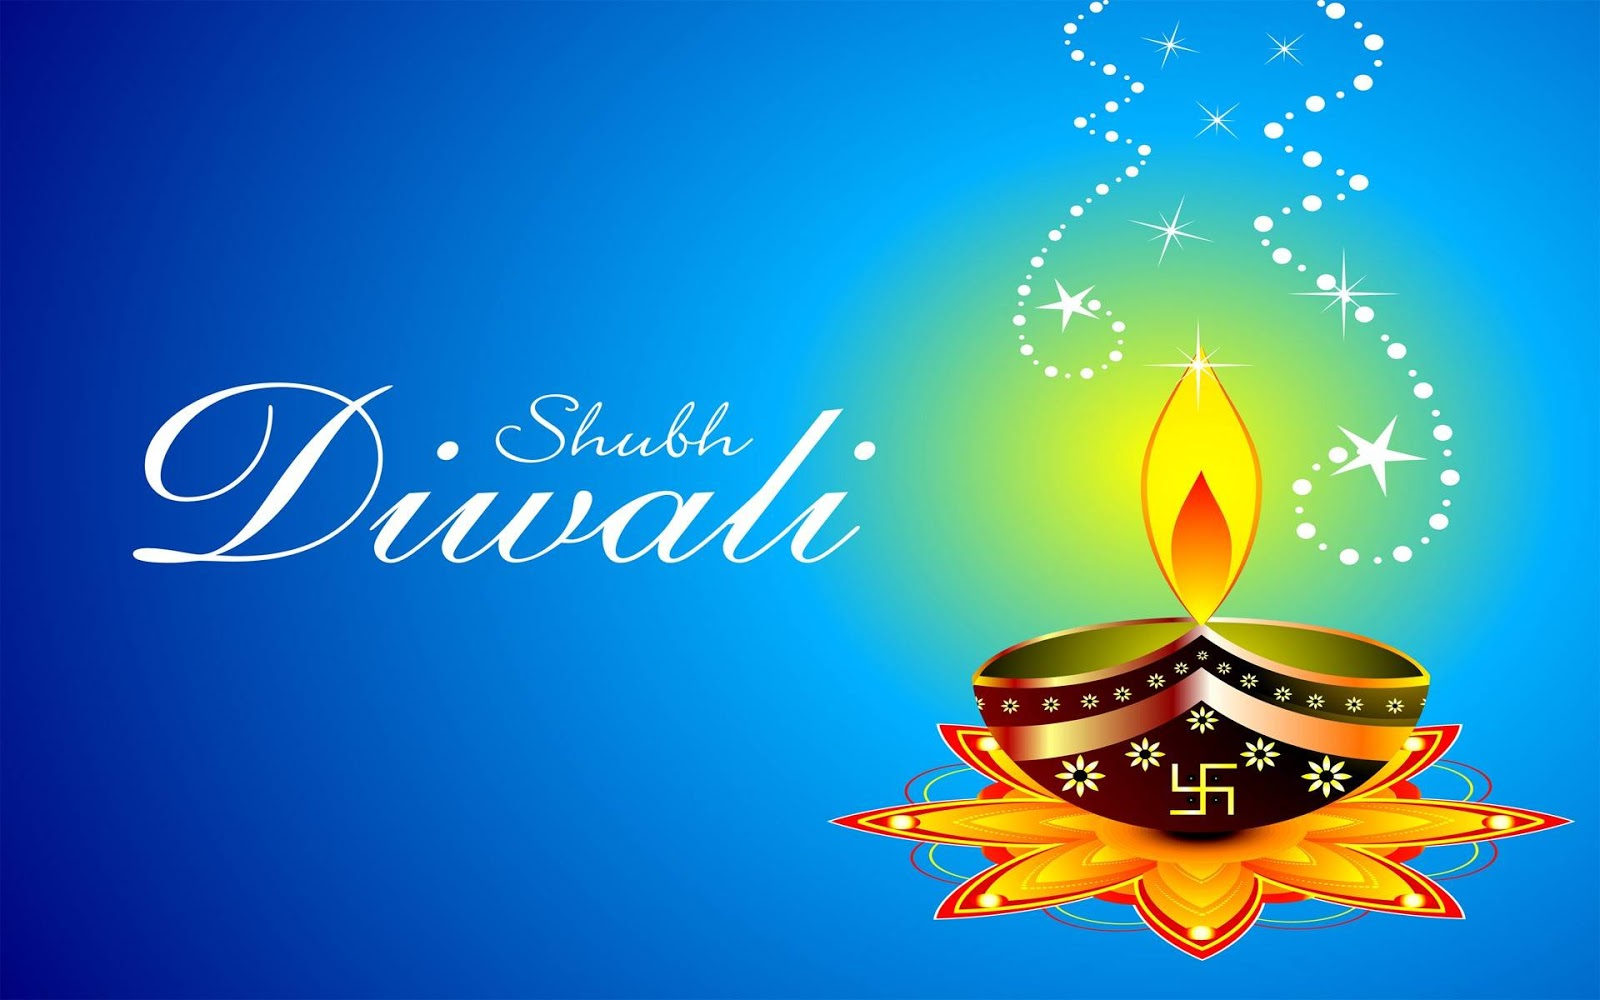 Deepavali & Lakshmi Puja Subhakankshalu - దీపావళి మరియు లక్ష్మి పూజ శుభాకాంక్షలు